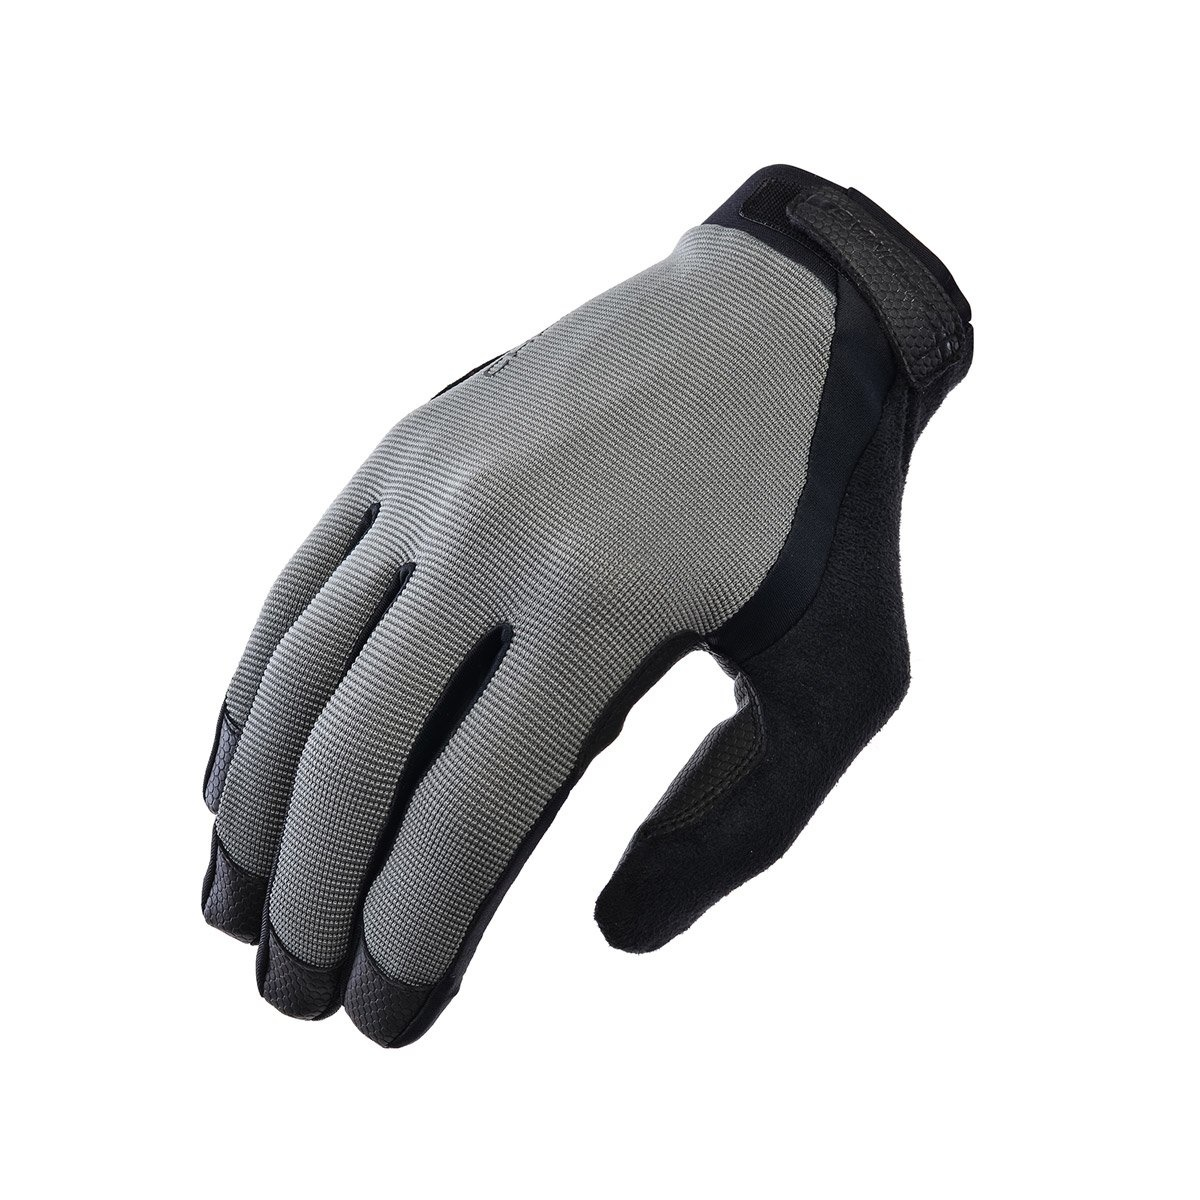 Chromag Glove Tact Medium Grey/Black-1